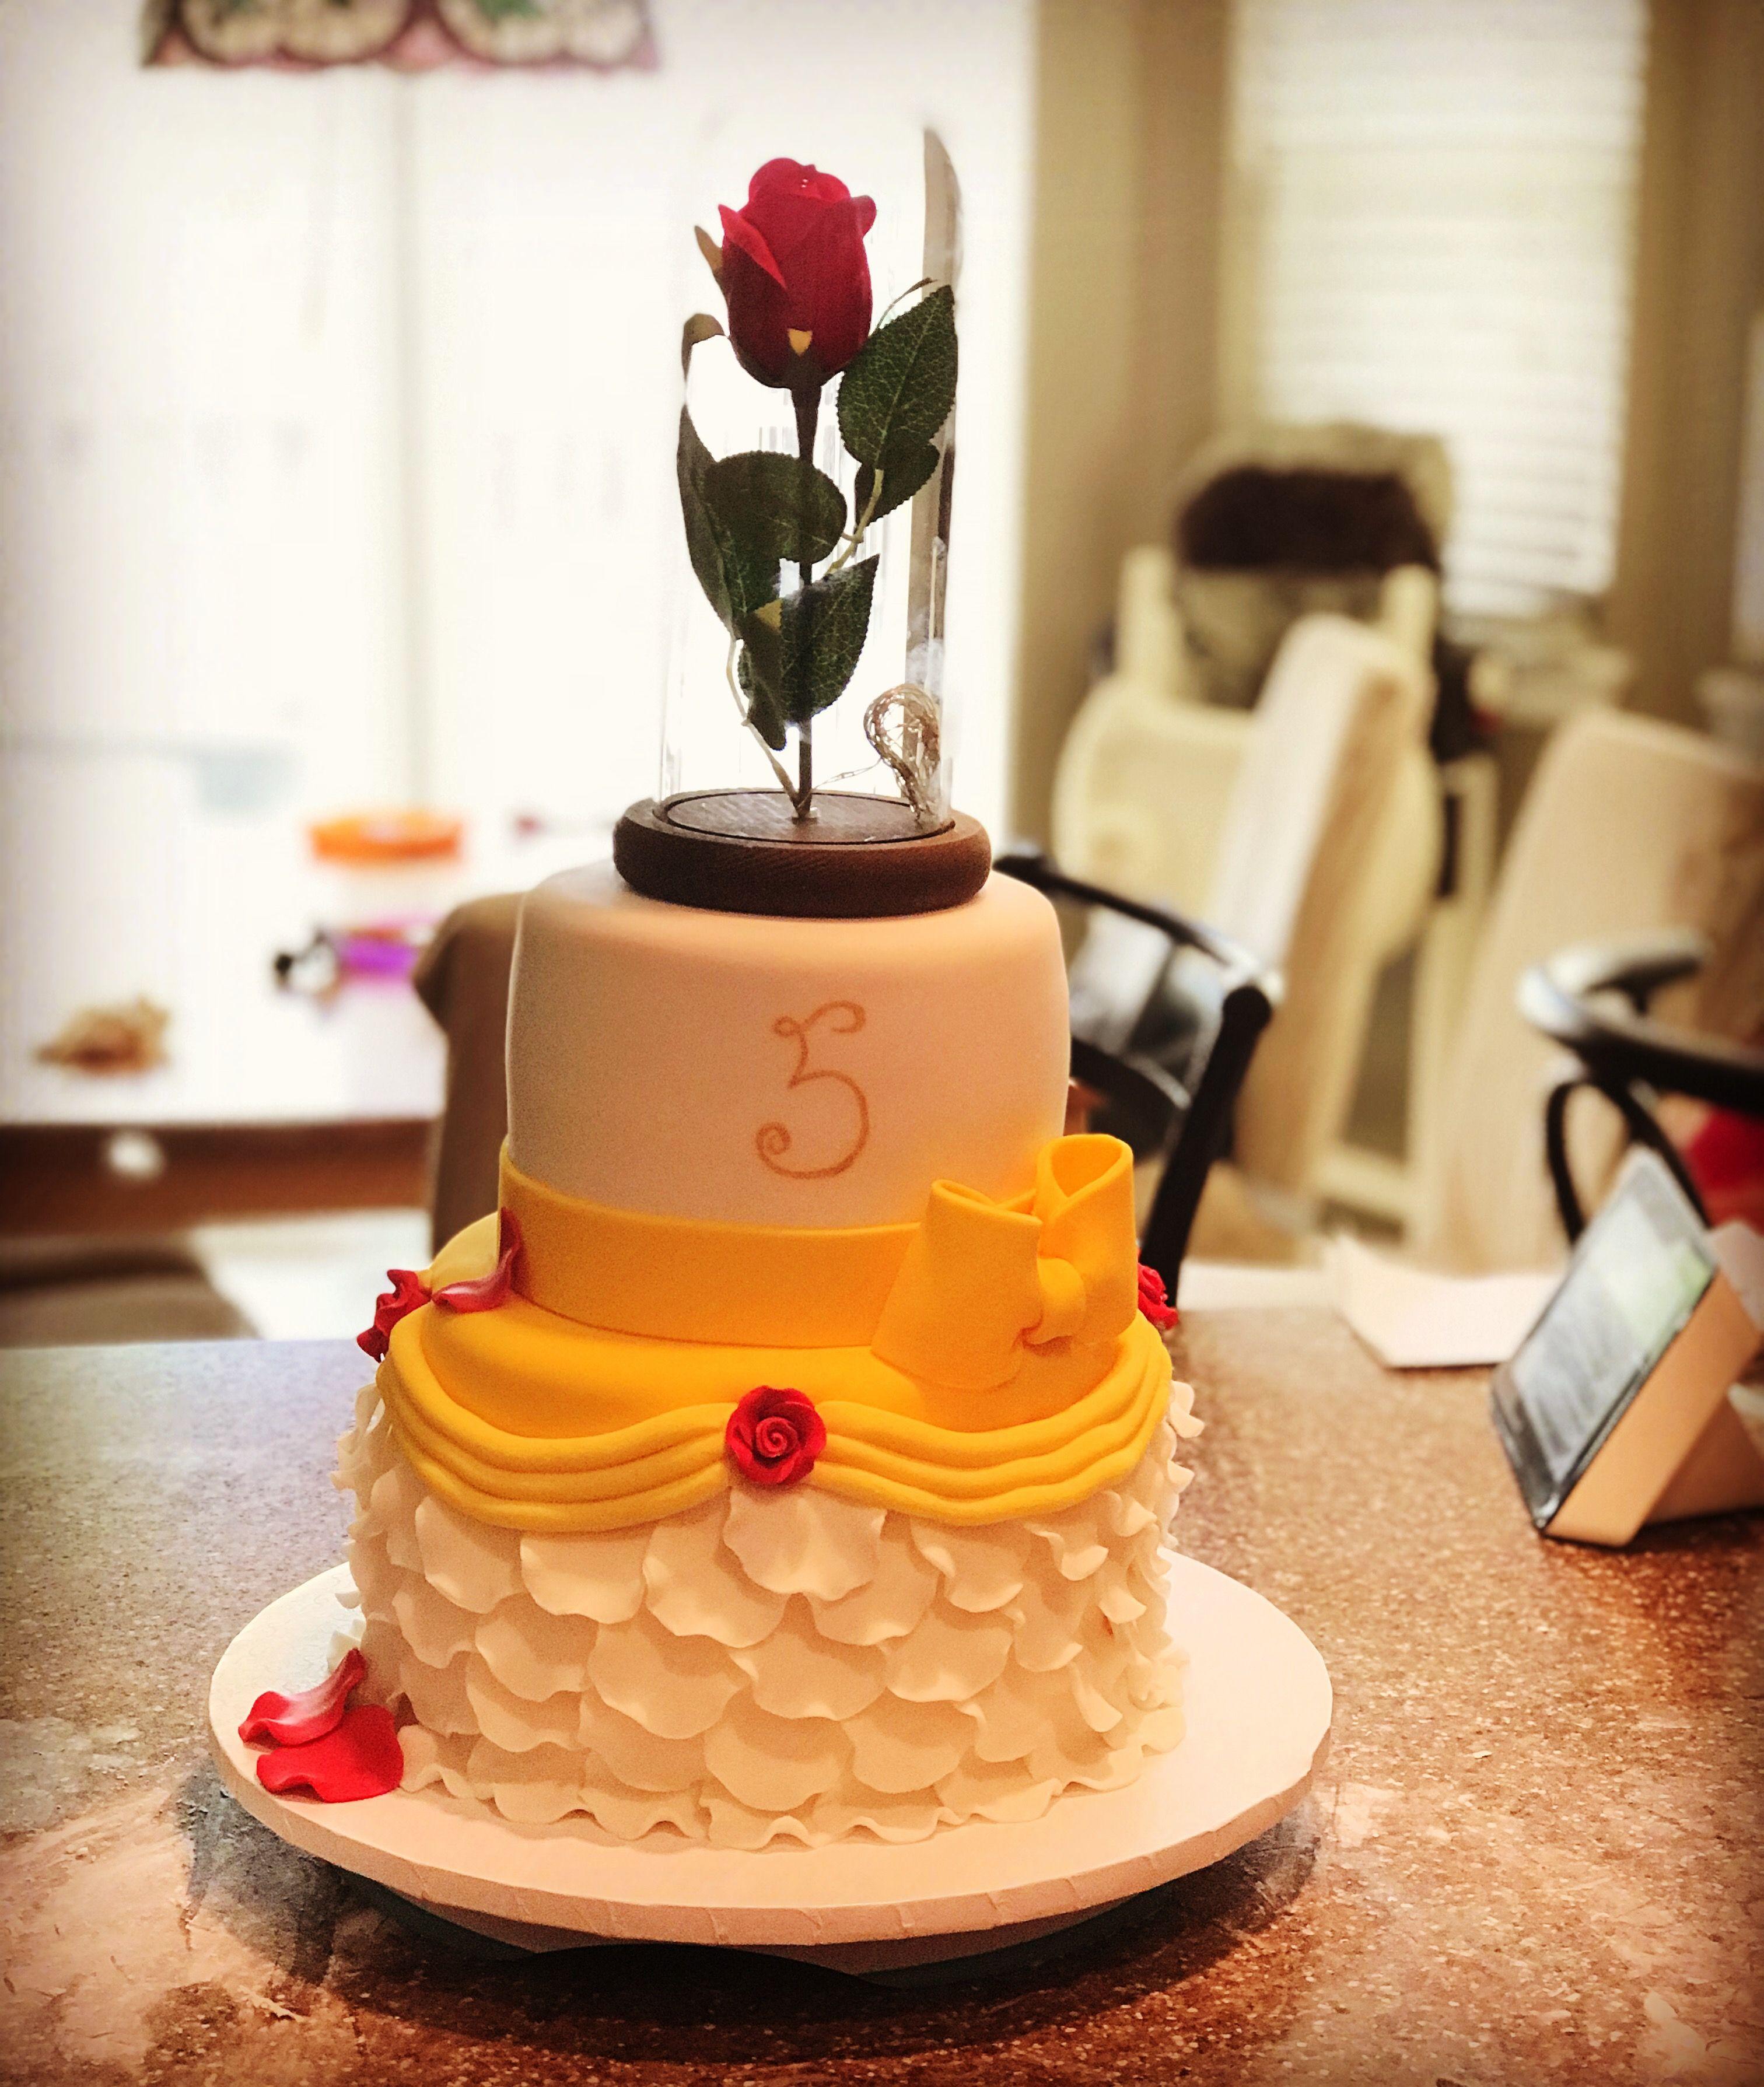 Beauty and the beast cake cake my daughter birthday